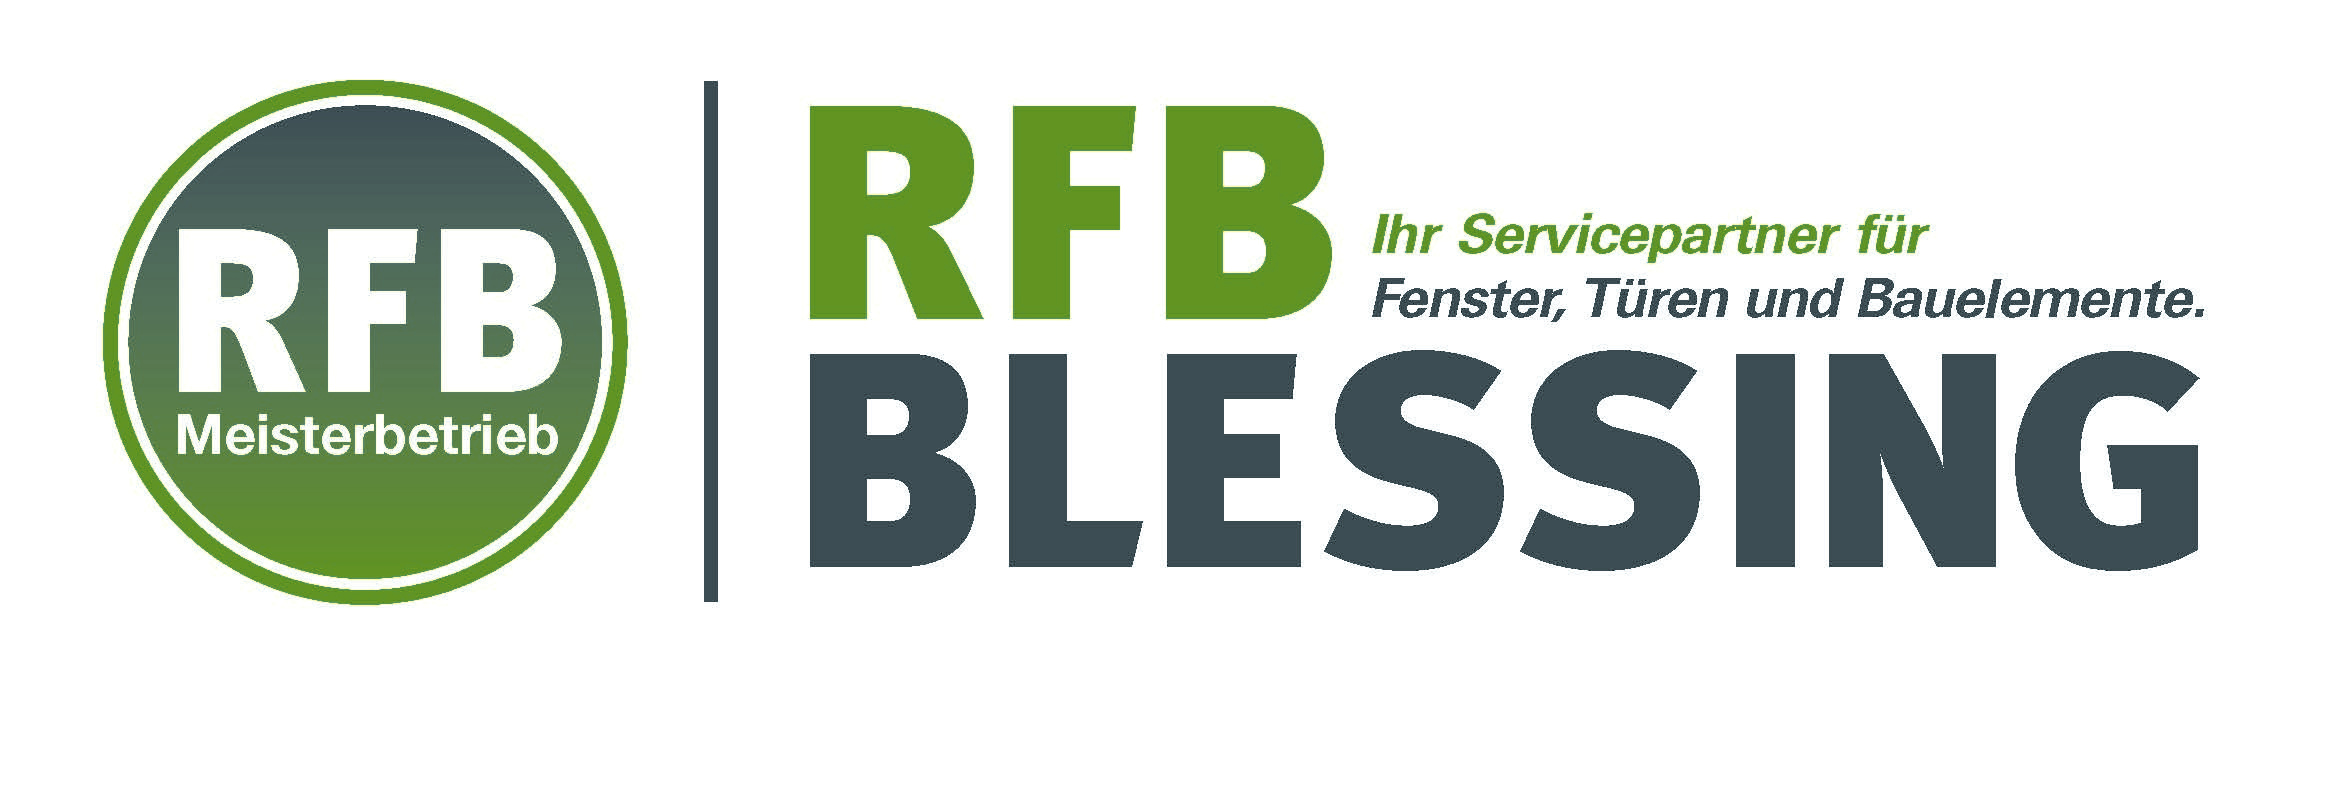 RFB - Ralf Blessing aus Berglen-Erlenhof